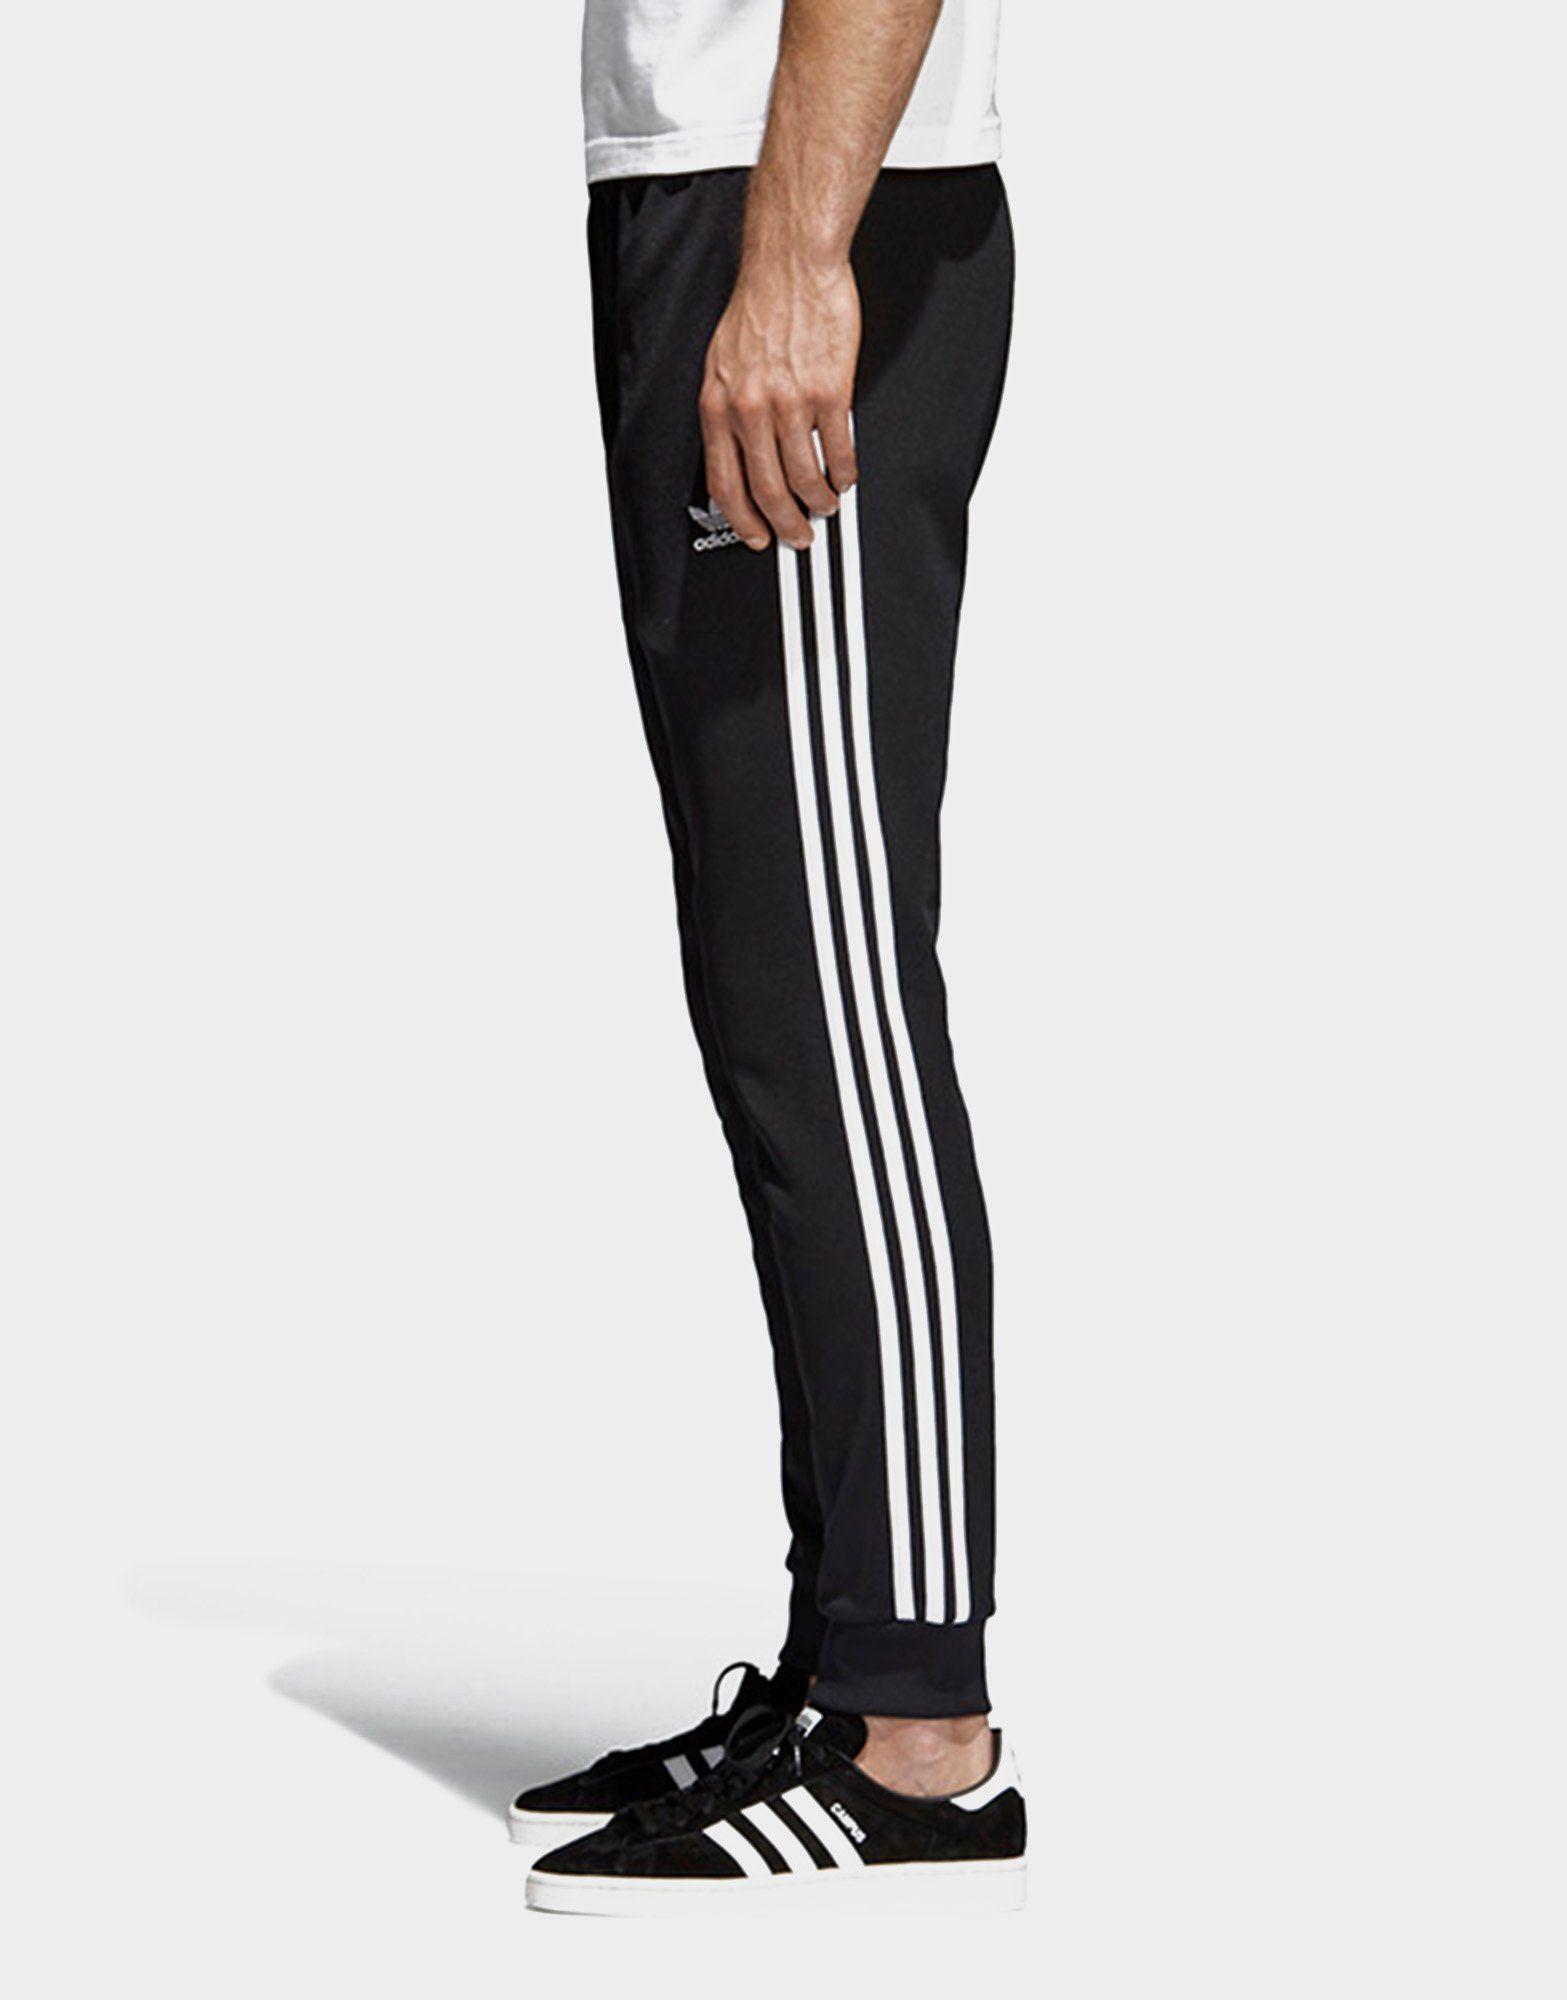 adidas Superstar Track Pants women's